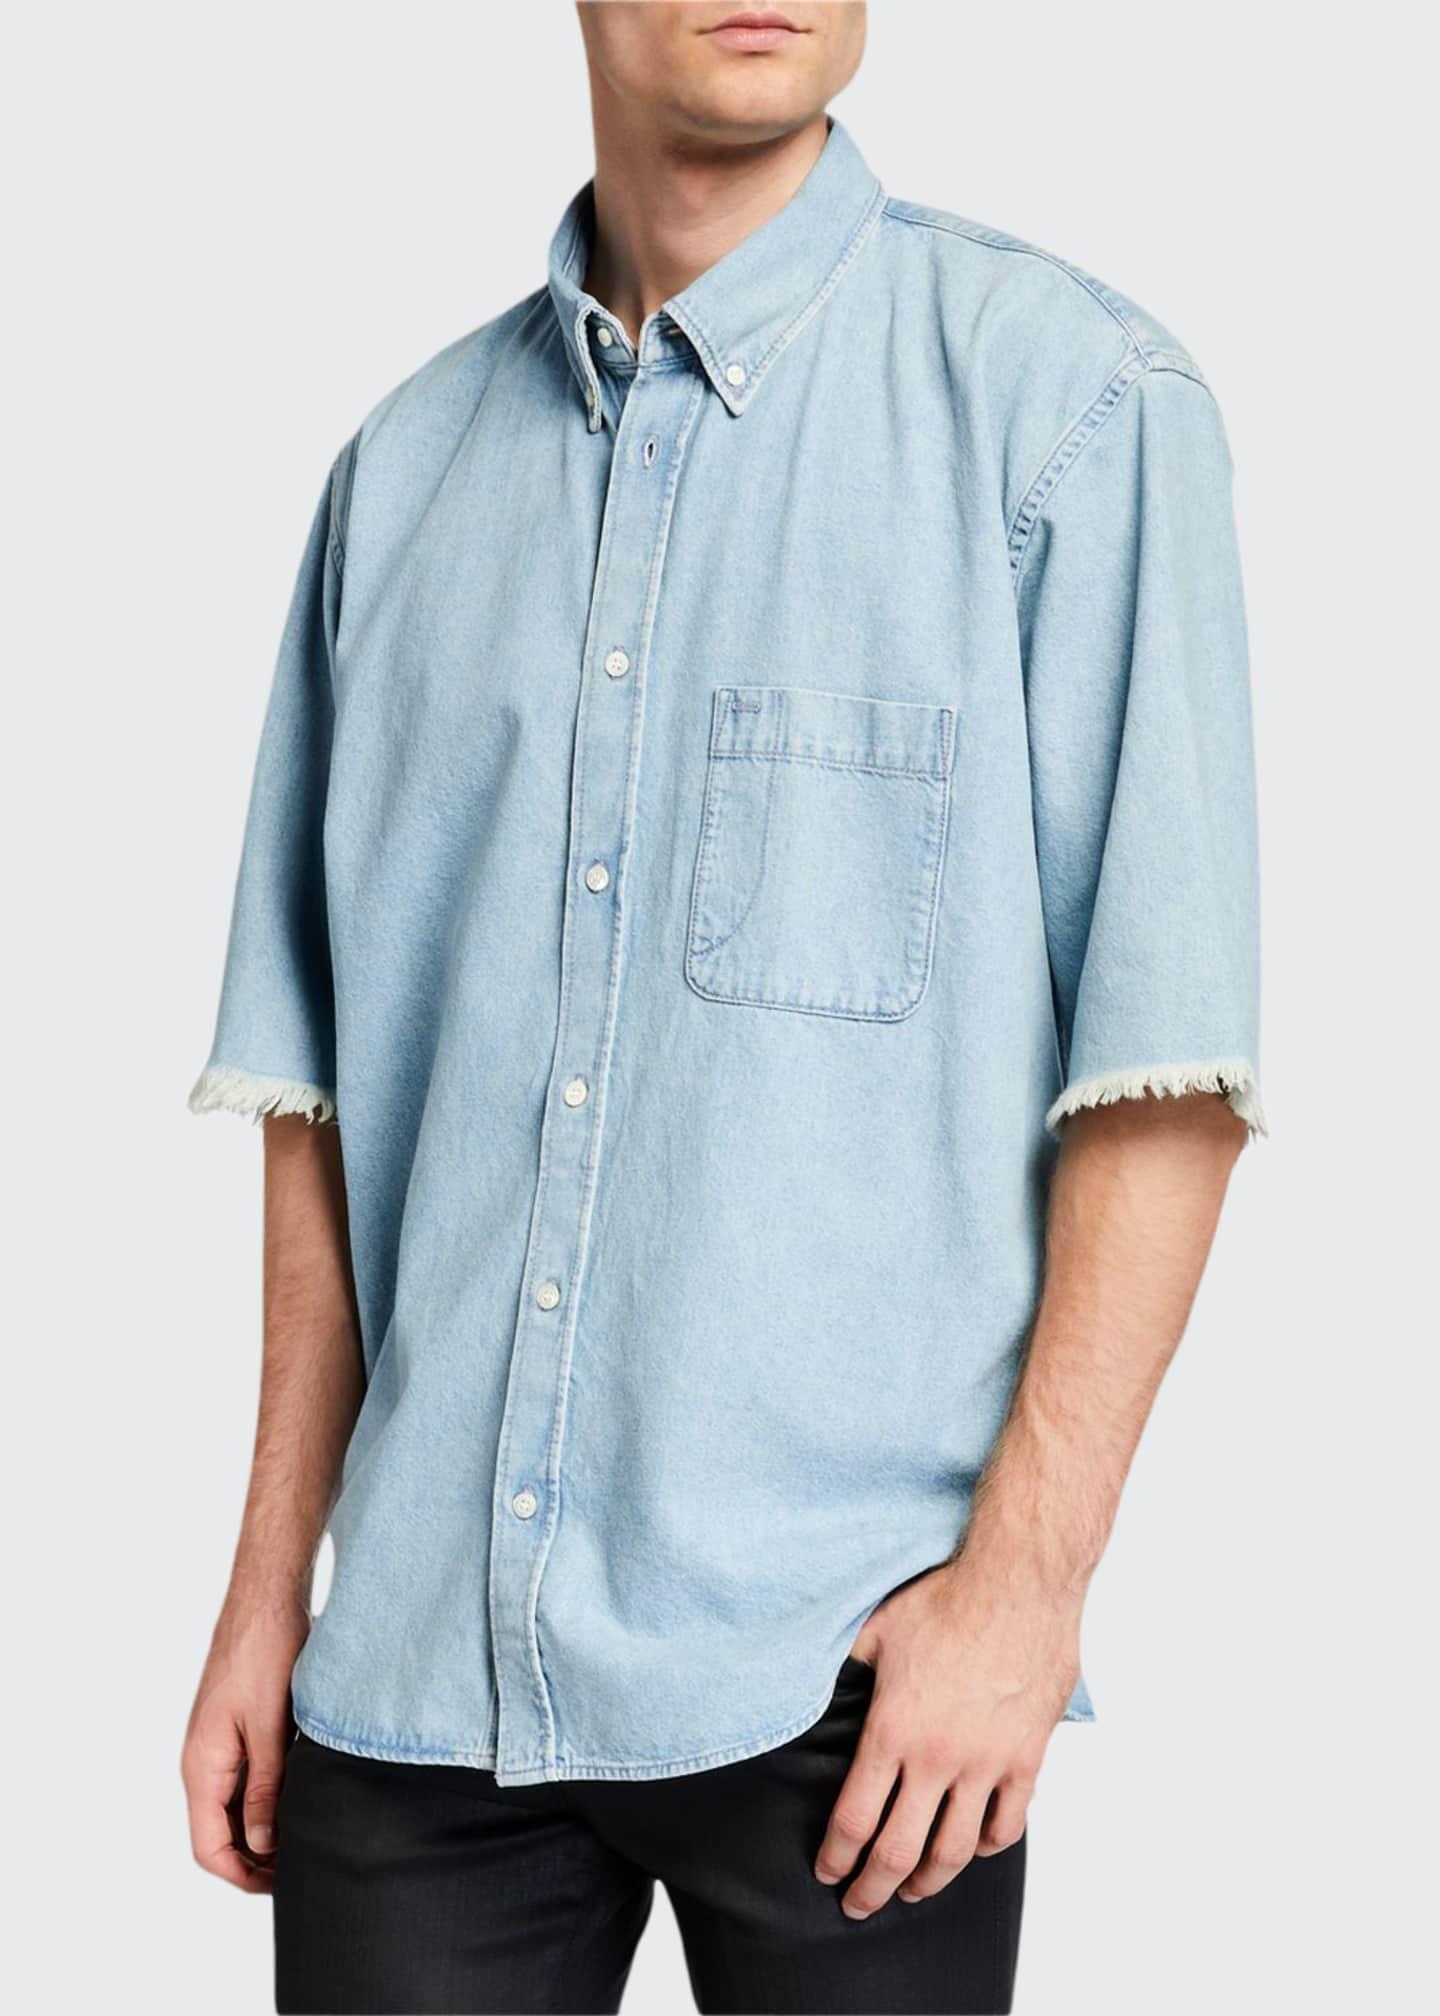 Balenciaga Men's Chambray Short-Sleeve Sport Shirt